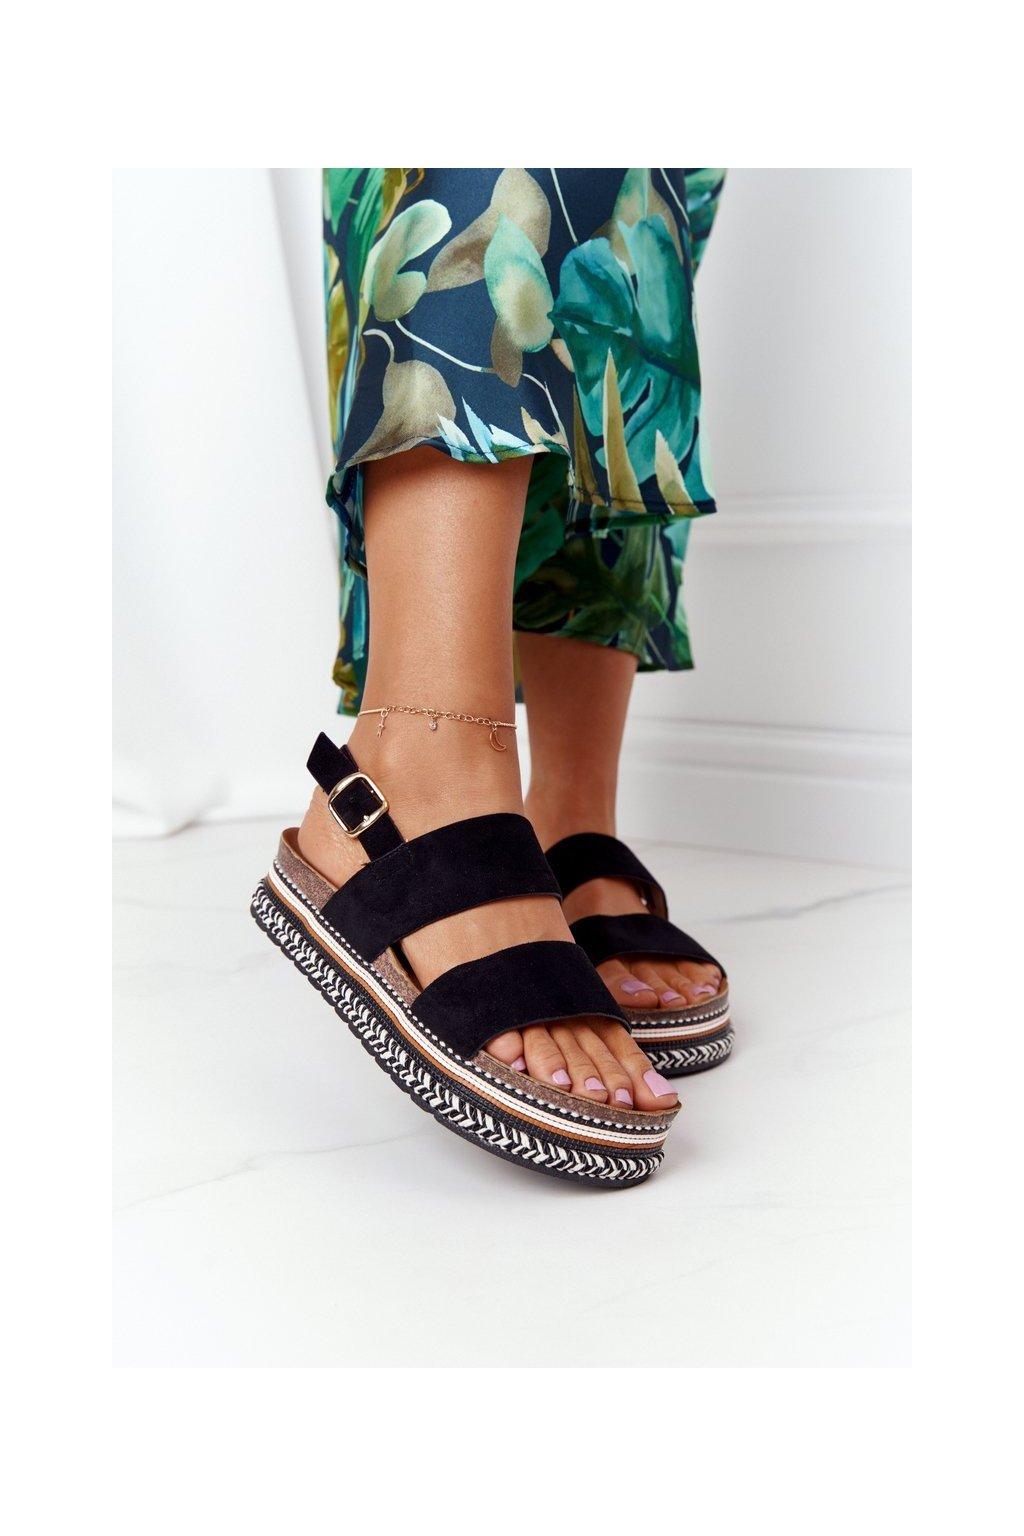 Čierne sandále NJSK 7857